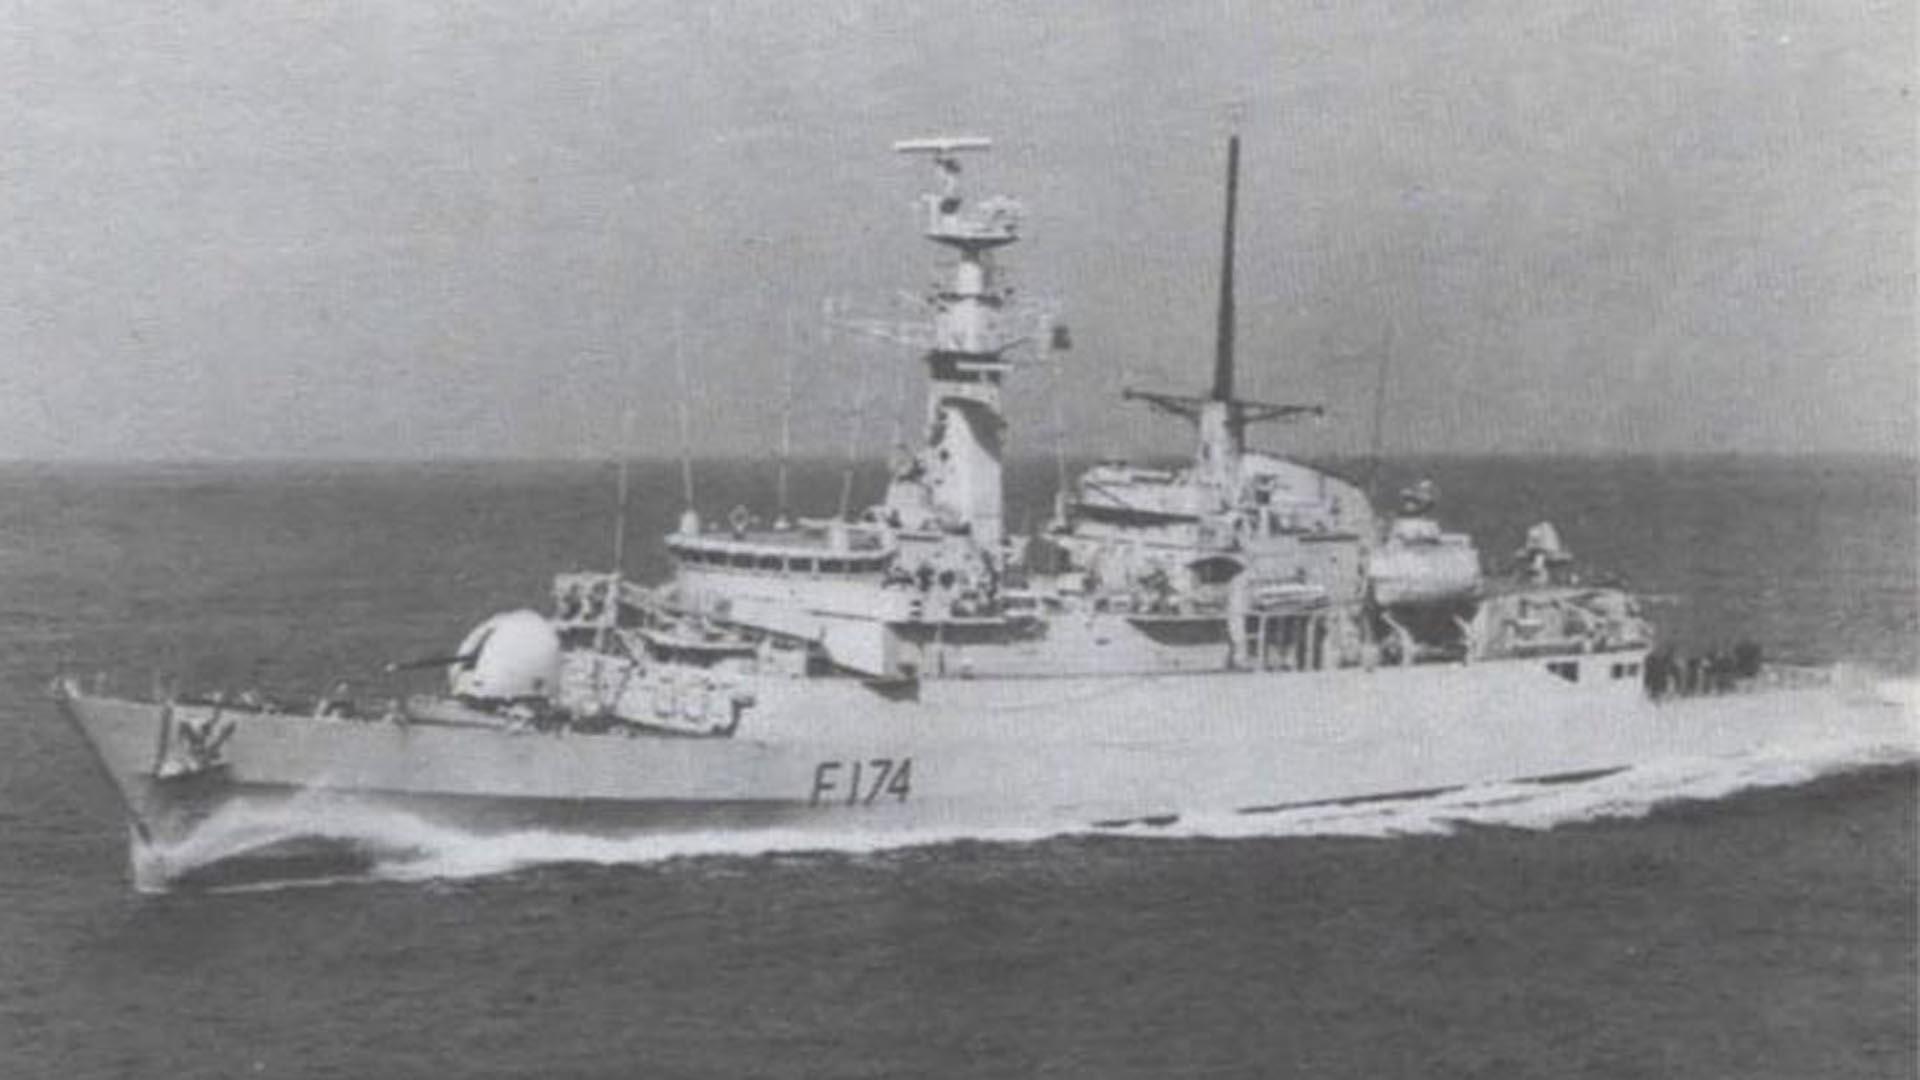 HMS Alacrity